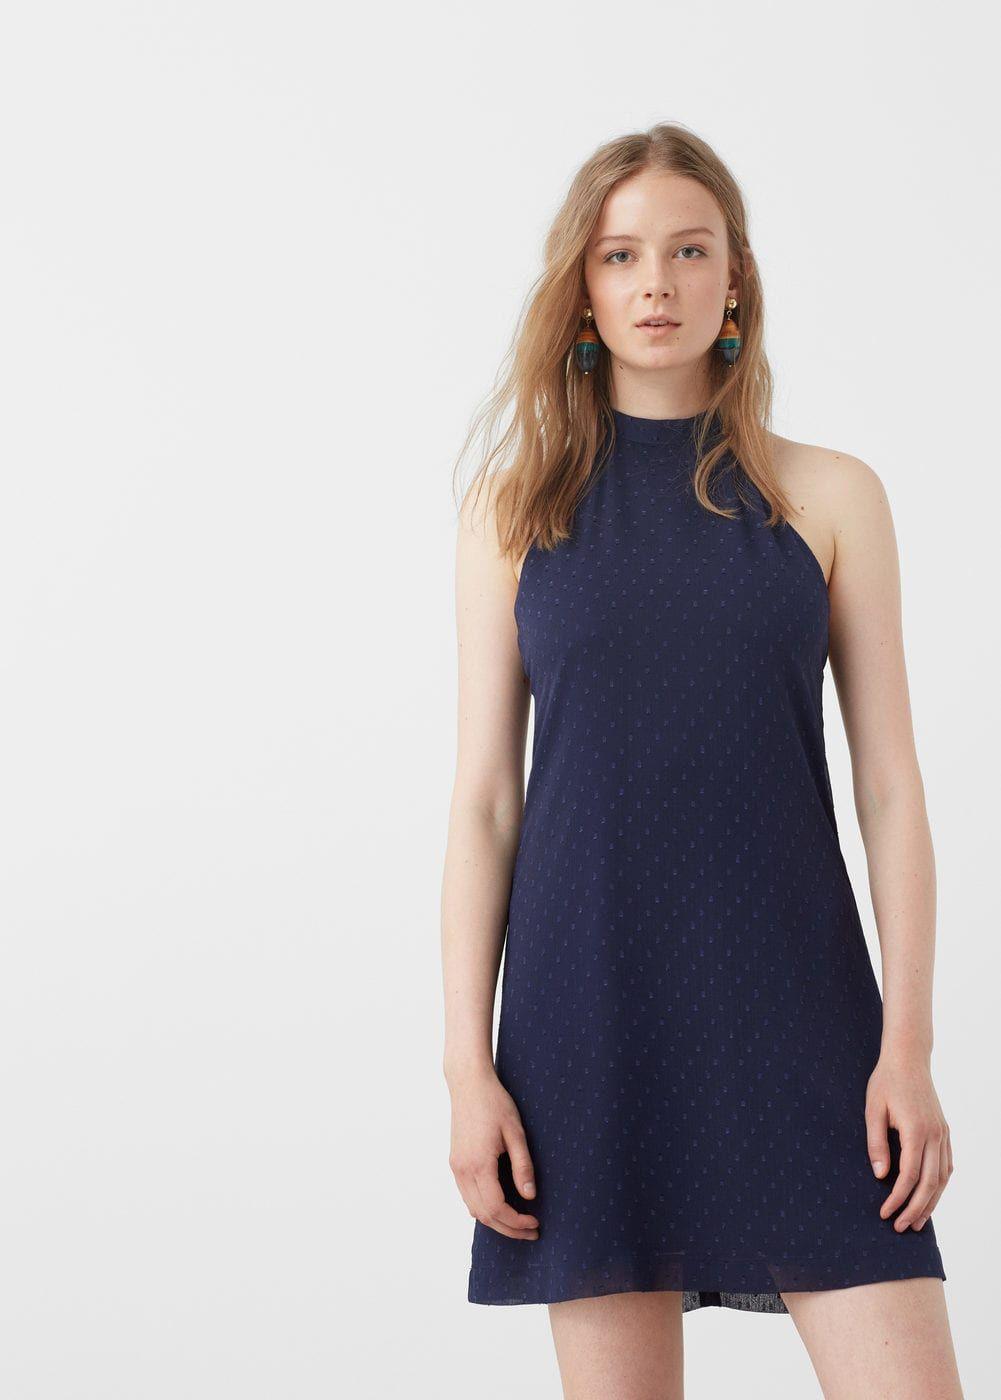 Robe texturée à pois - Femme   shopping list   Robe, Vetements et ... b1f32fca9e0a